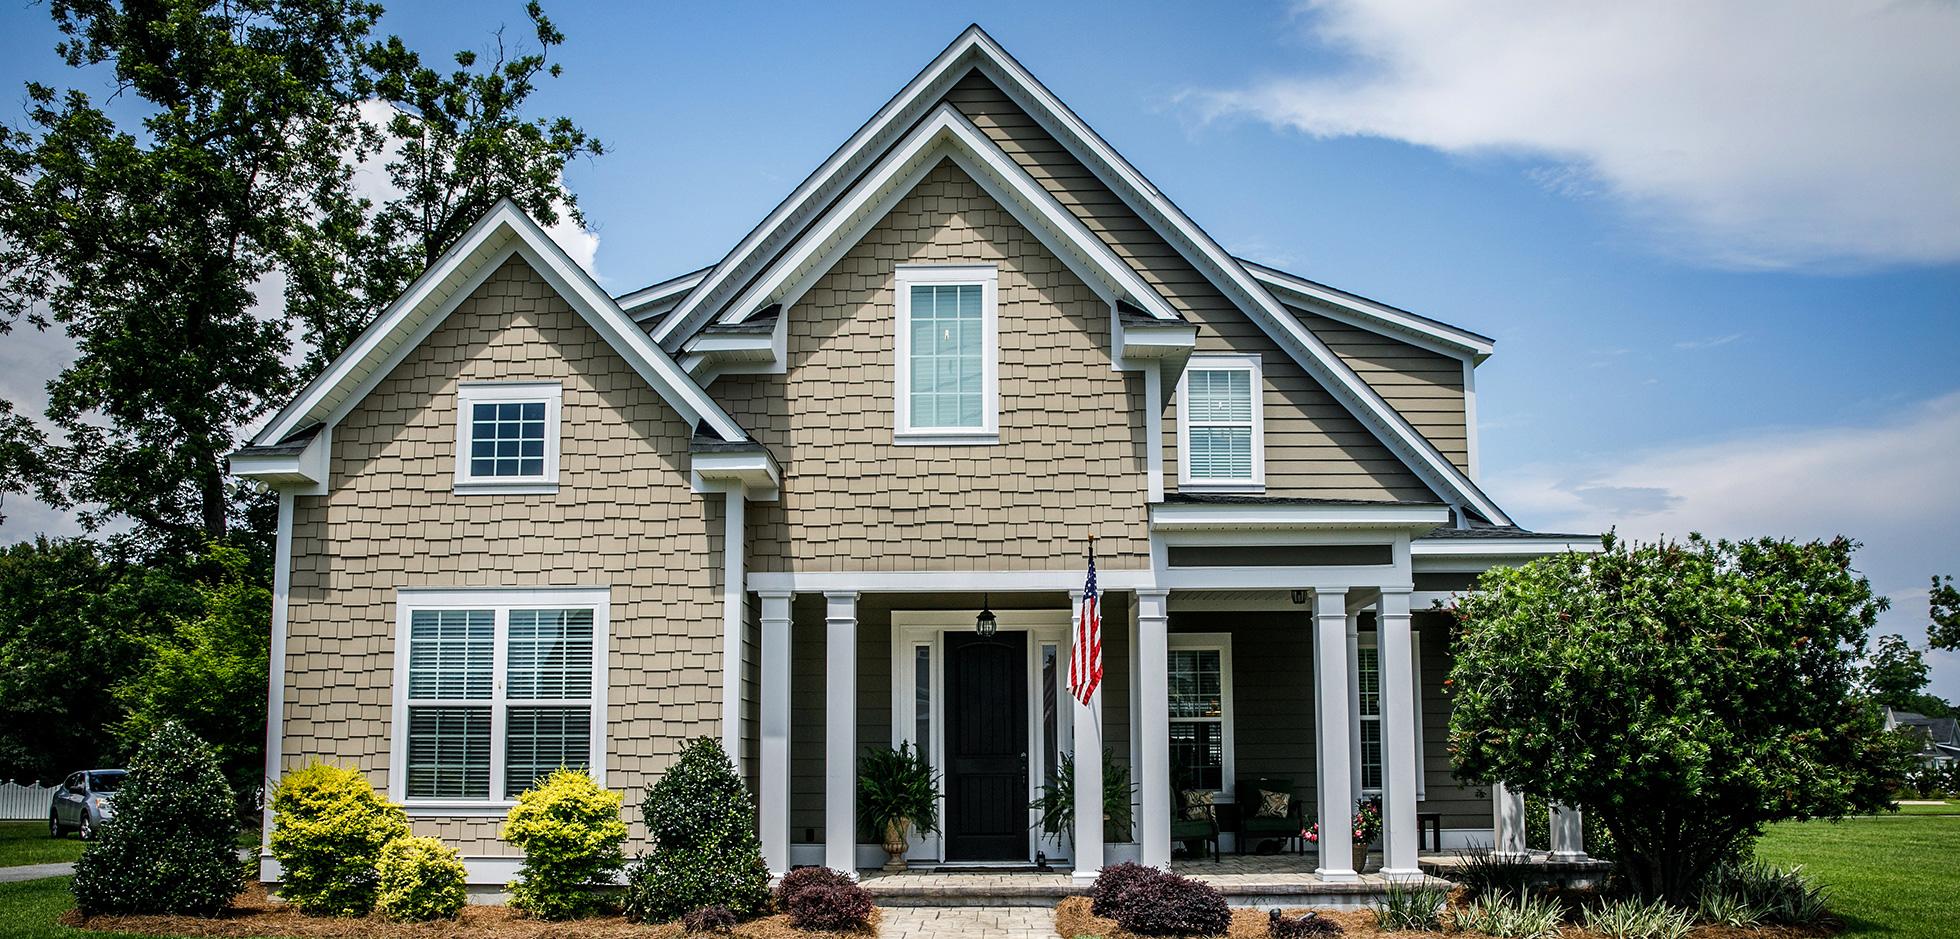 Madison Home Siding Repair